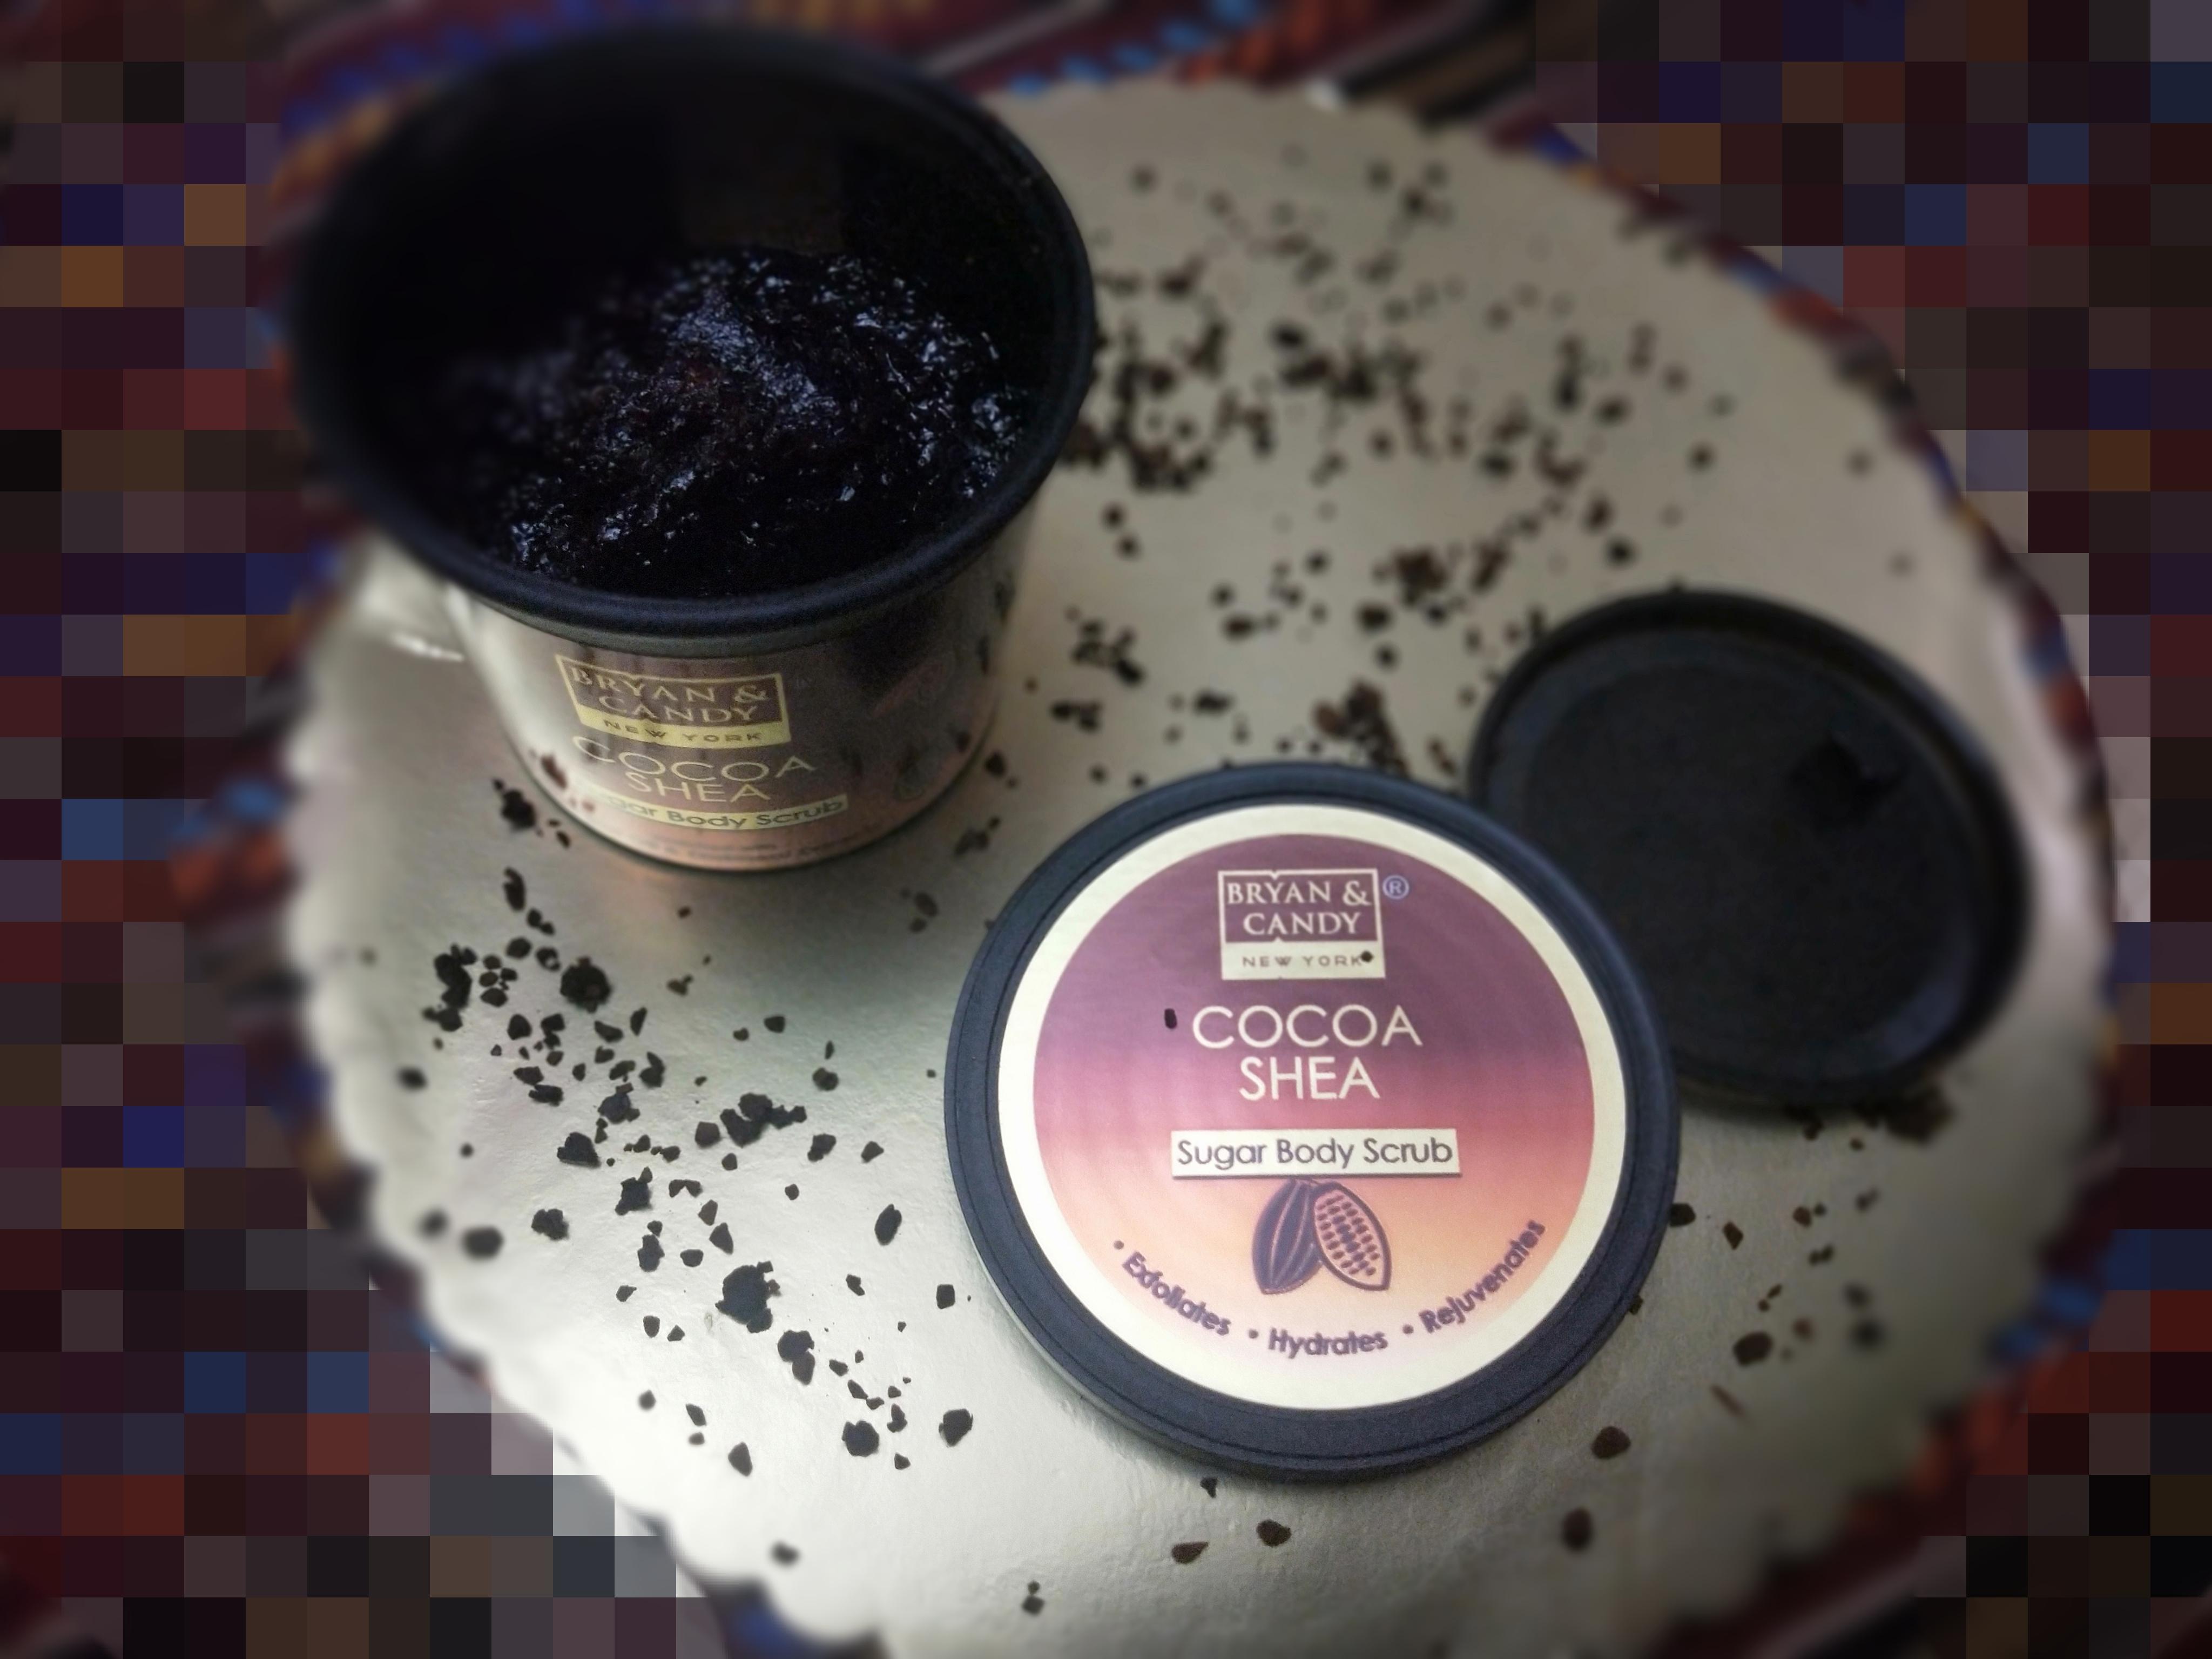 Bryan & Candy New York Cocoa Shea Sugar Body Scrub-Excellent Body Scrub-By kajal_harvara